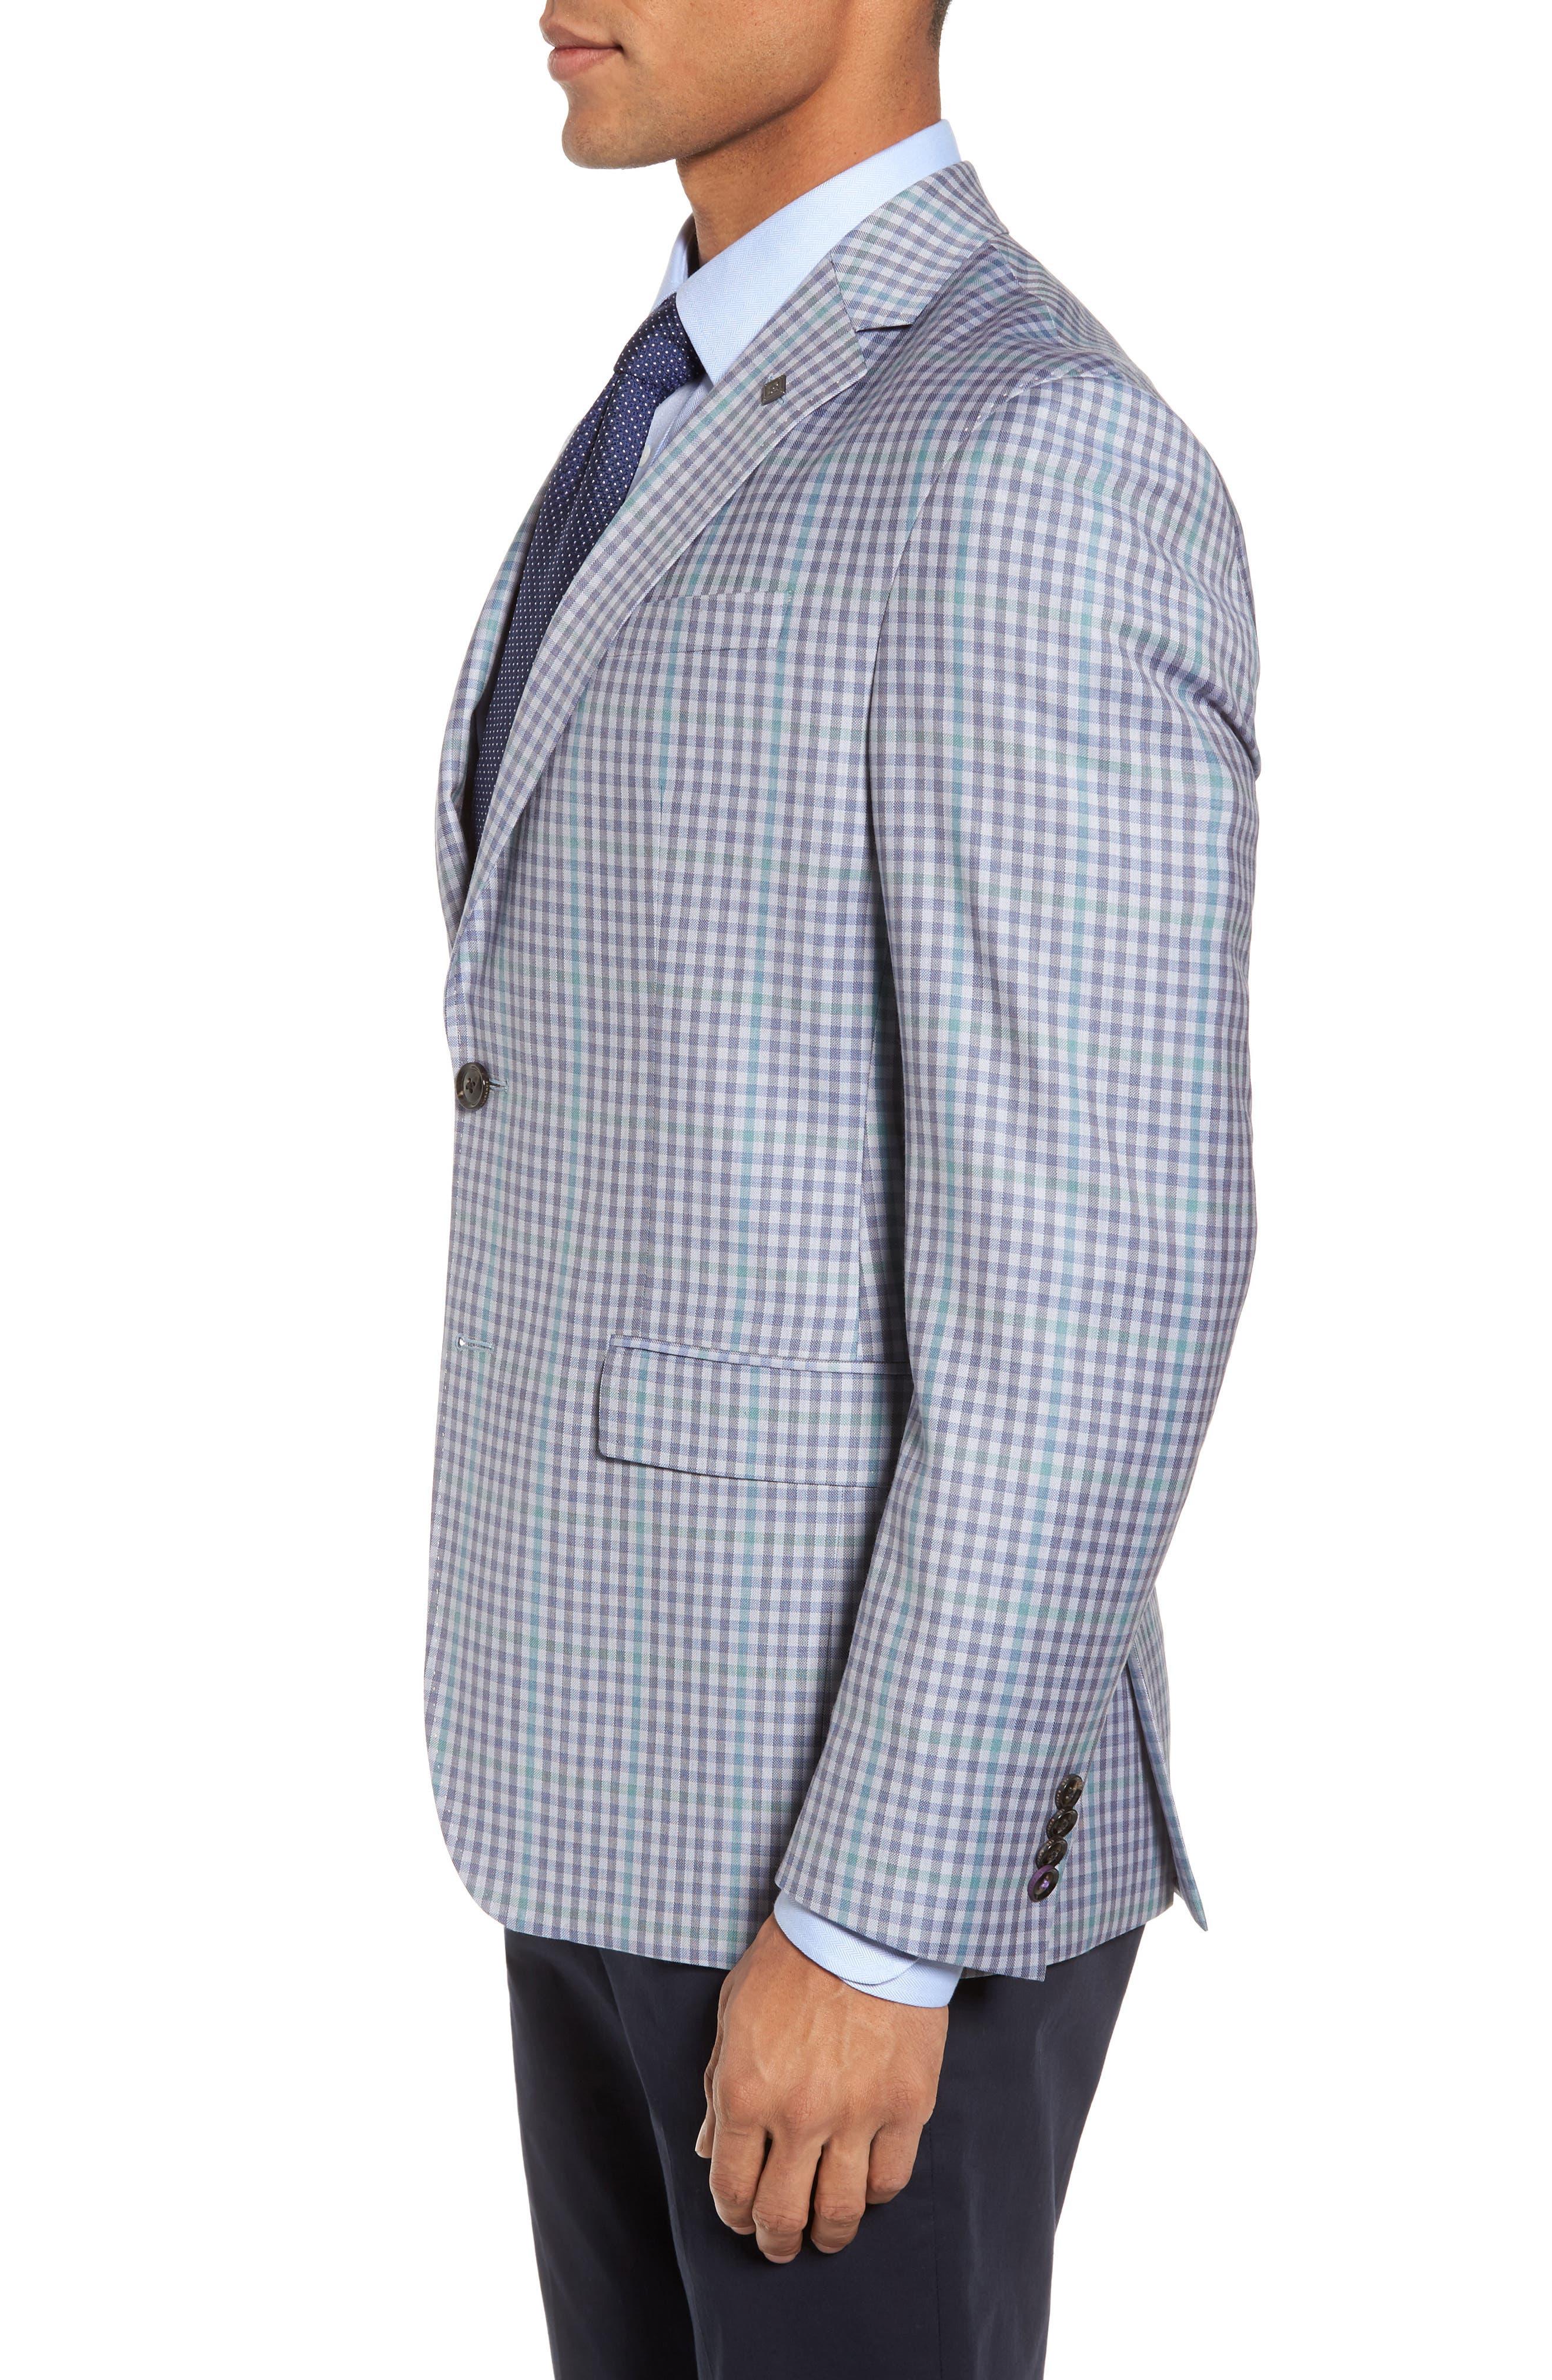 Konan Trim Fit Check Wool Sport Coat,                             Alternate thumbnail 3, color,                             Blue Grey Green Ck